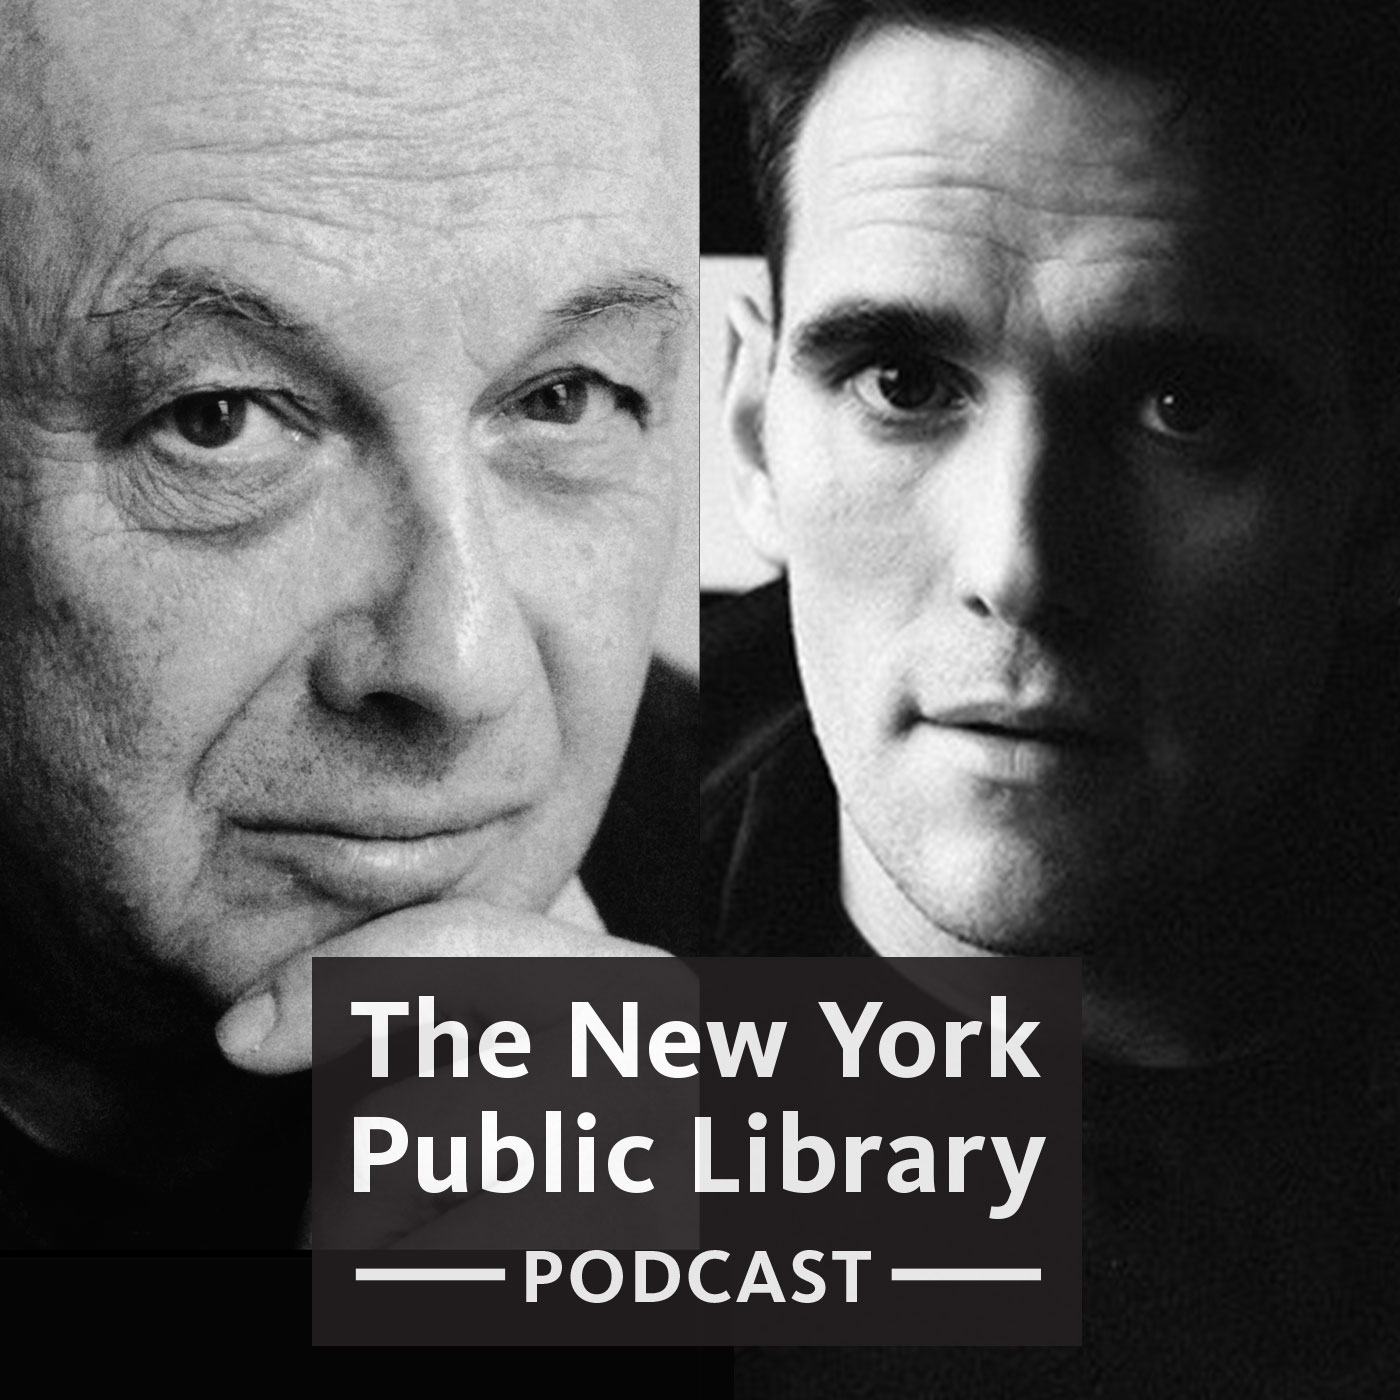 Bruce Davidson & Matt Dillon on Lasting Impressions